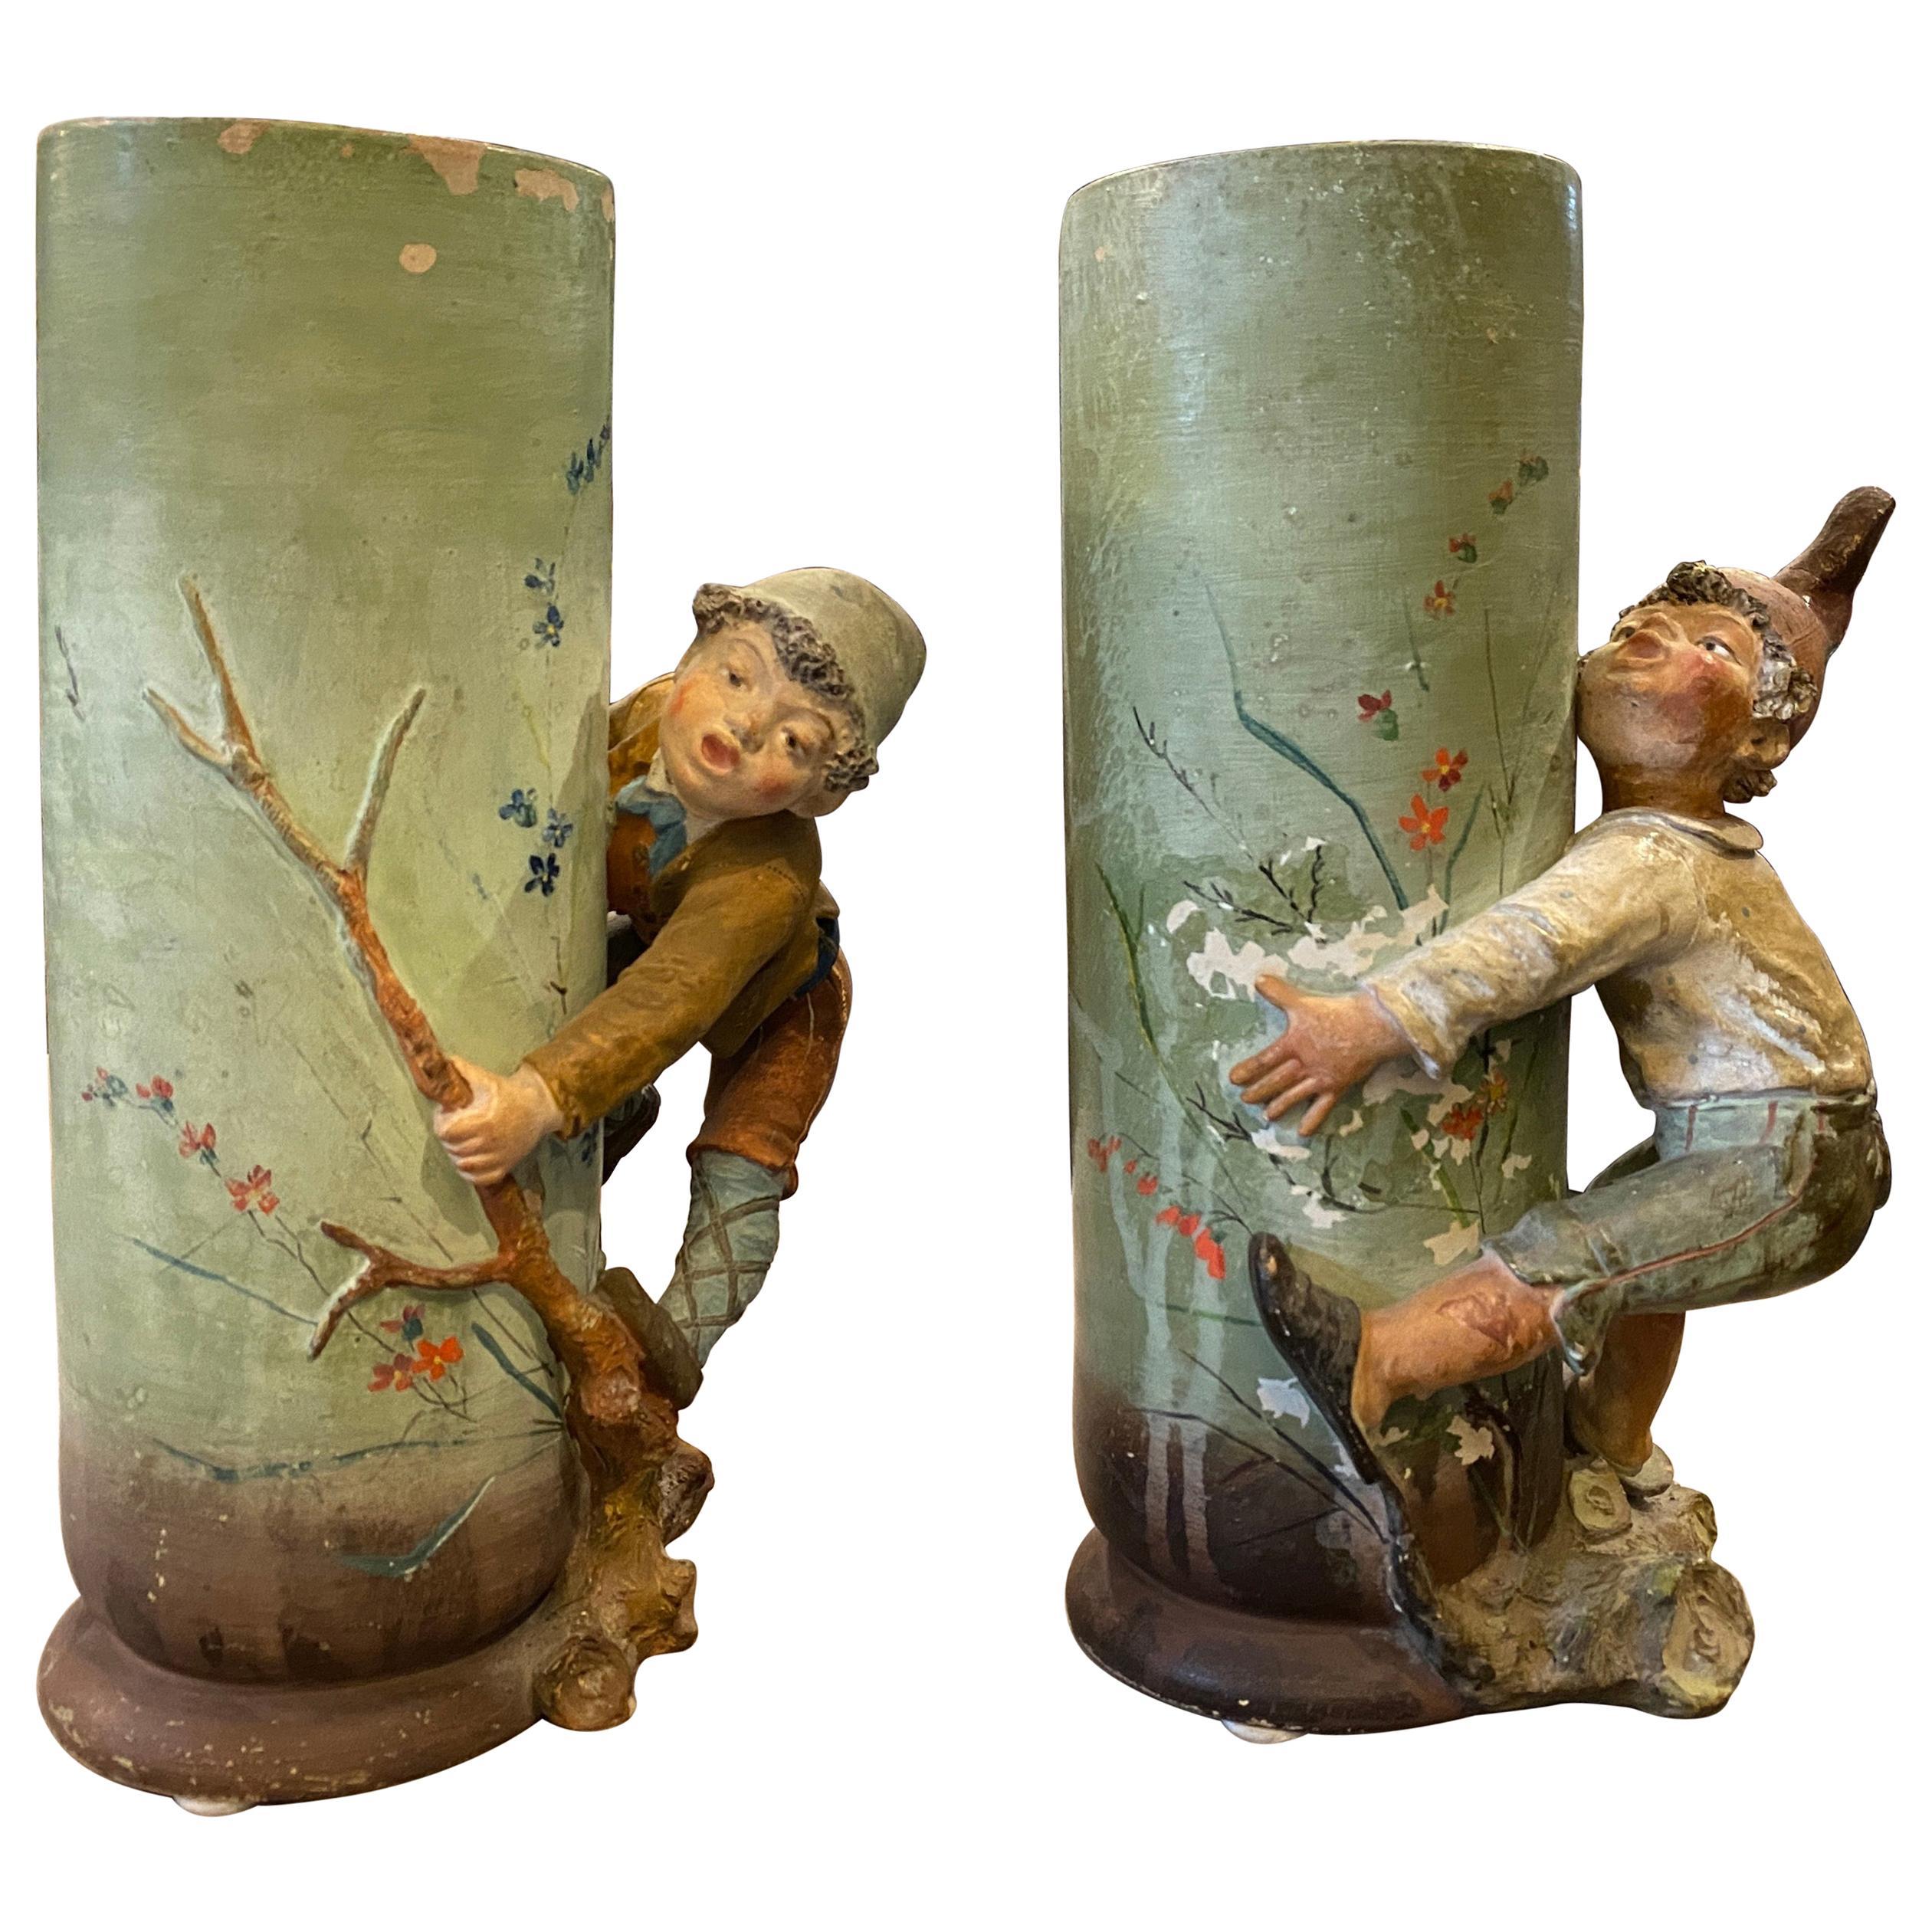 Set of Two Art Nouveau Ceramic Neapolitan Vases, 1900s